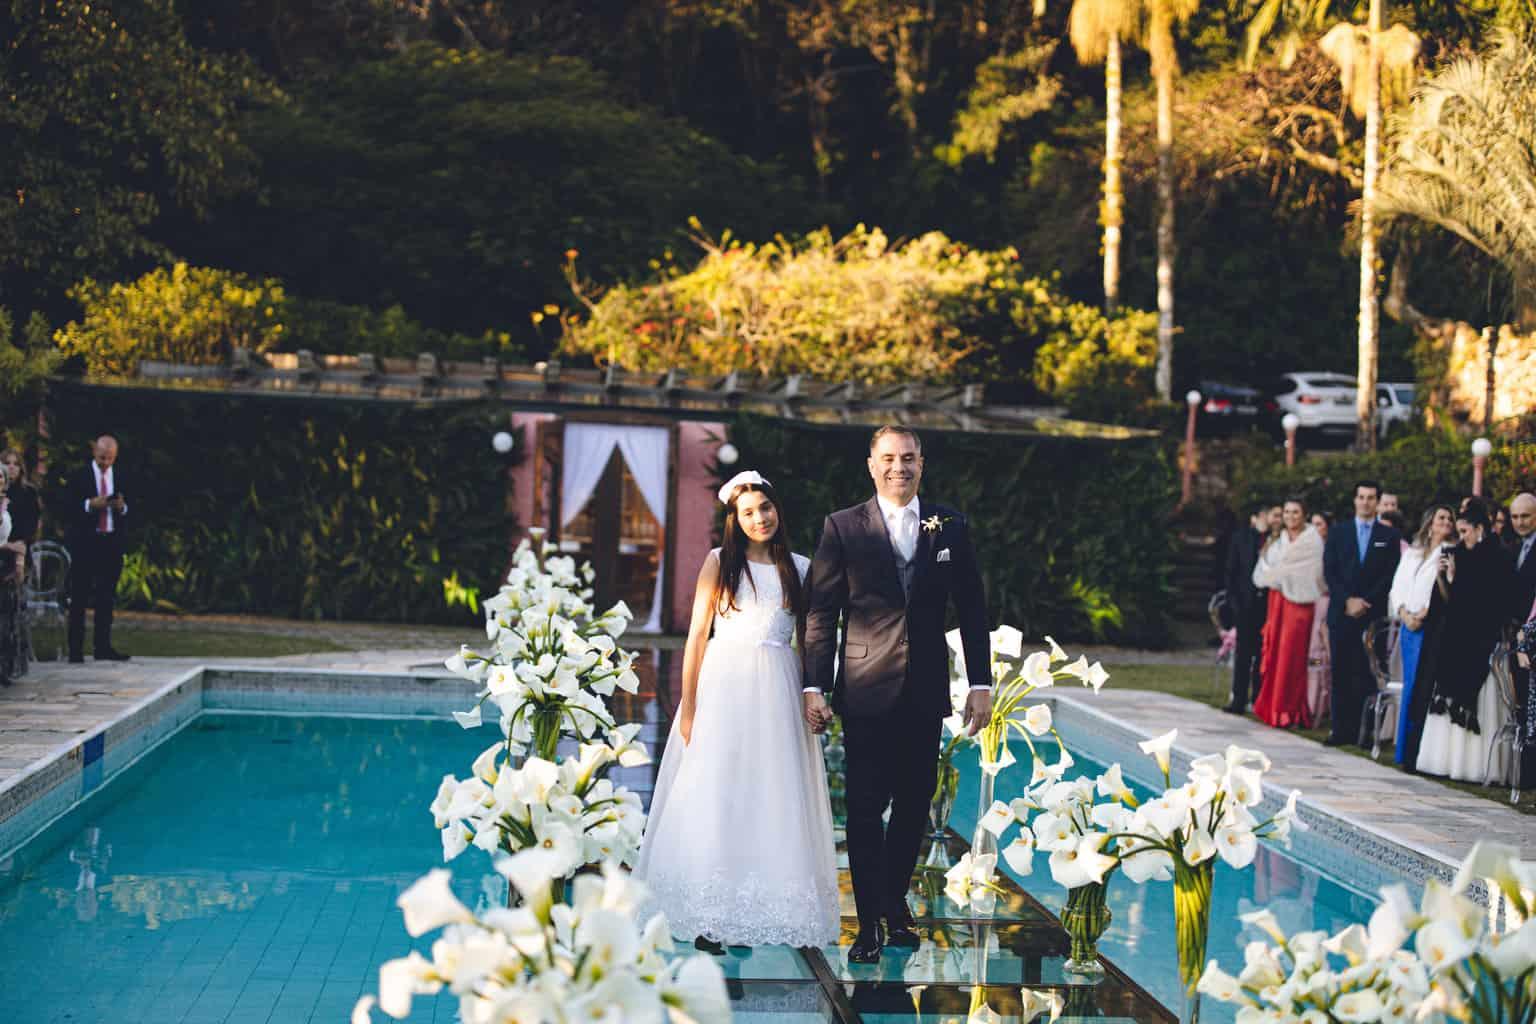 Casamento-de-Bianka-e-Nilo-Fotografia-Marcelo-Schmoeller-SC-Alameda-Casa-Rosa-03082019_bianka-e-nilo_0973